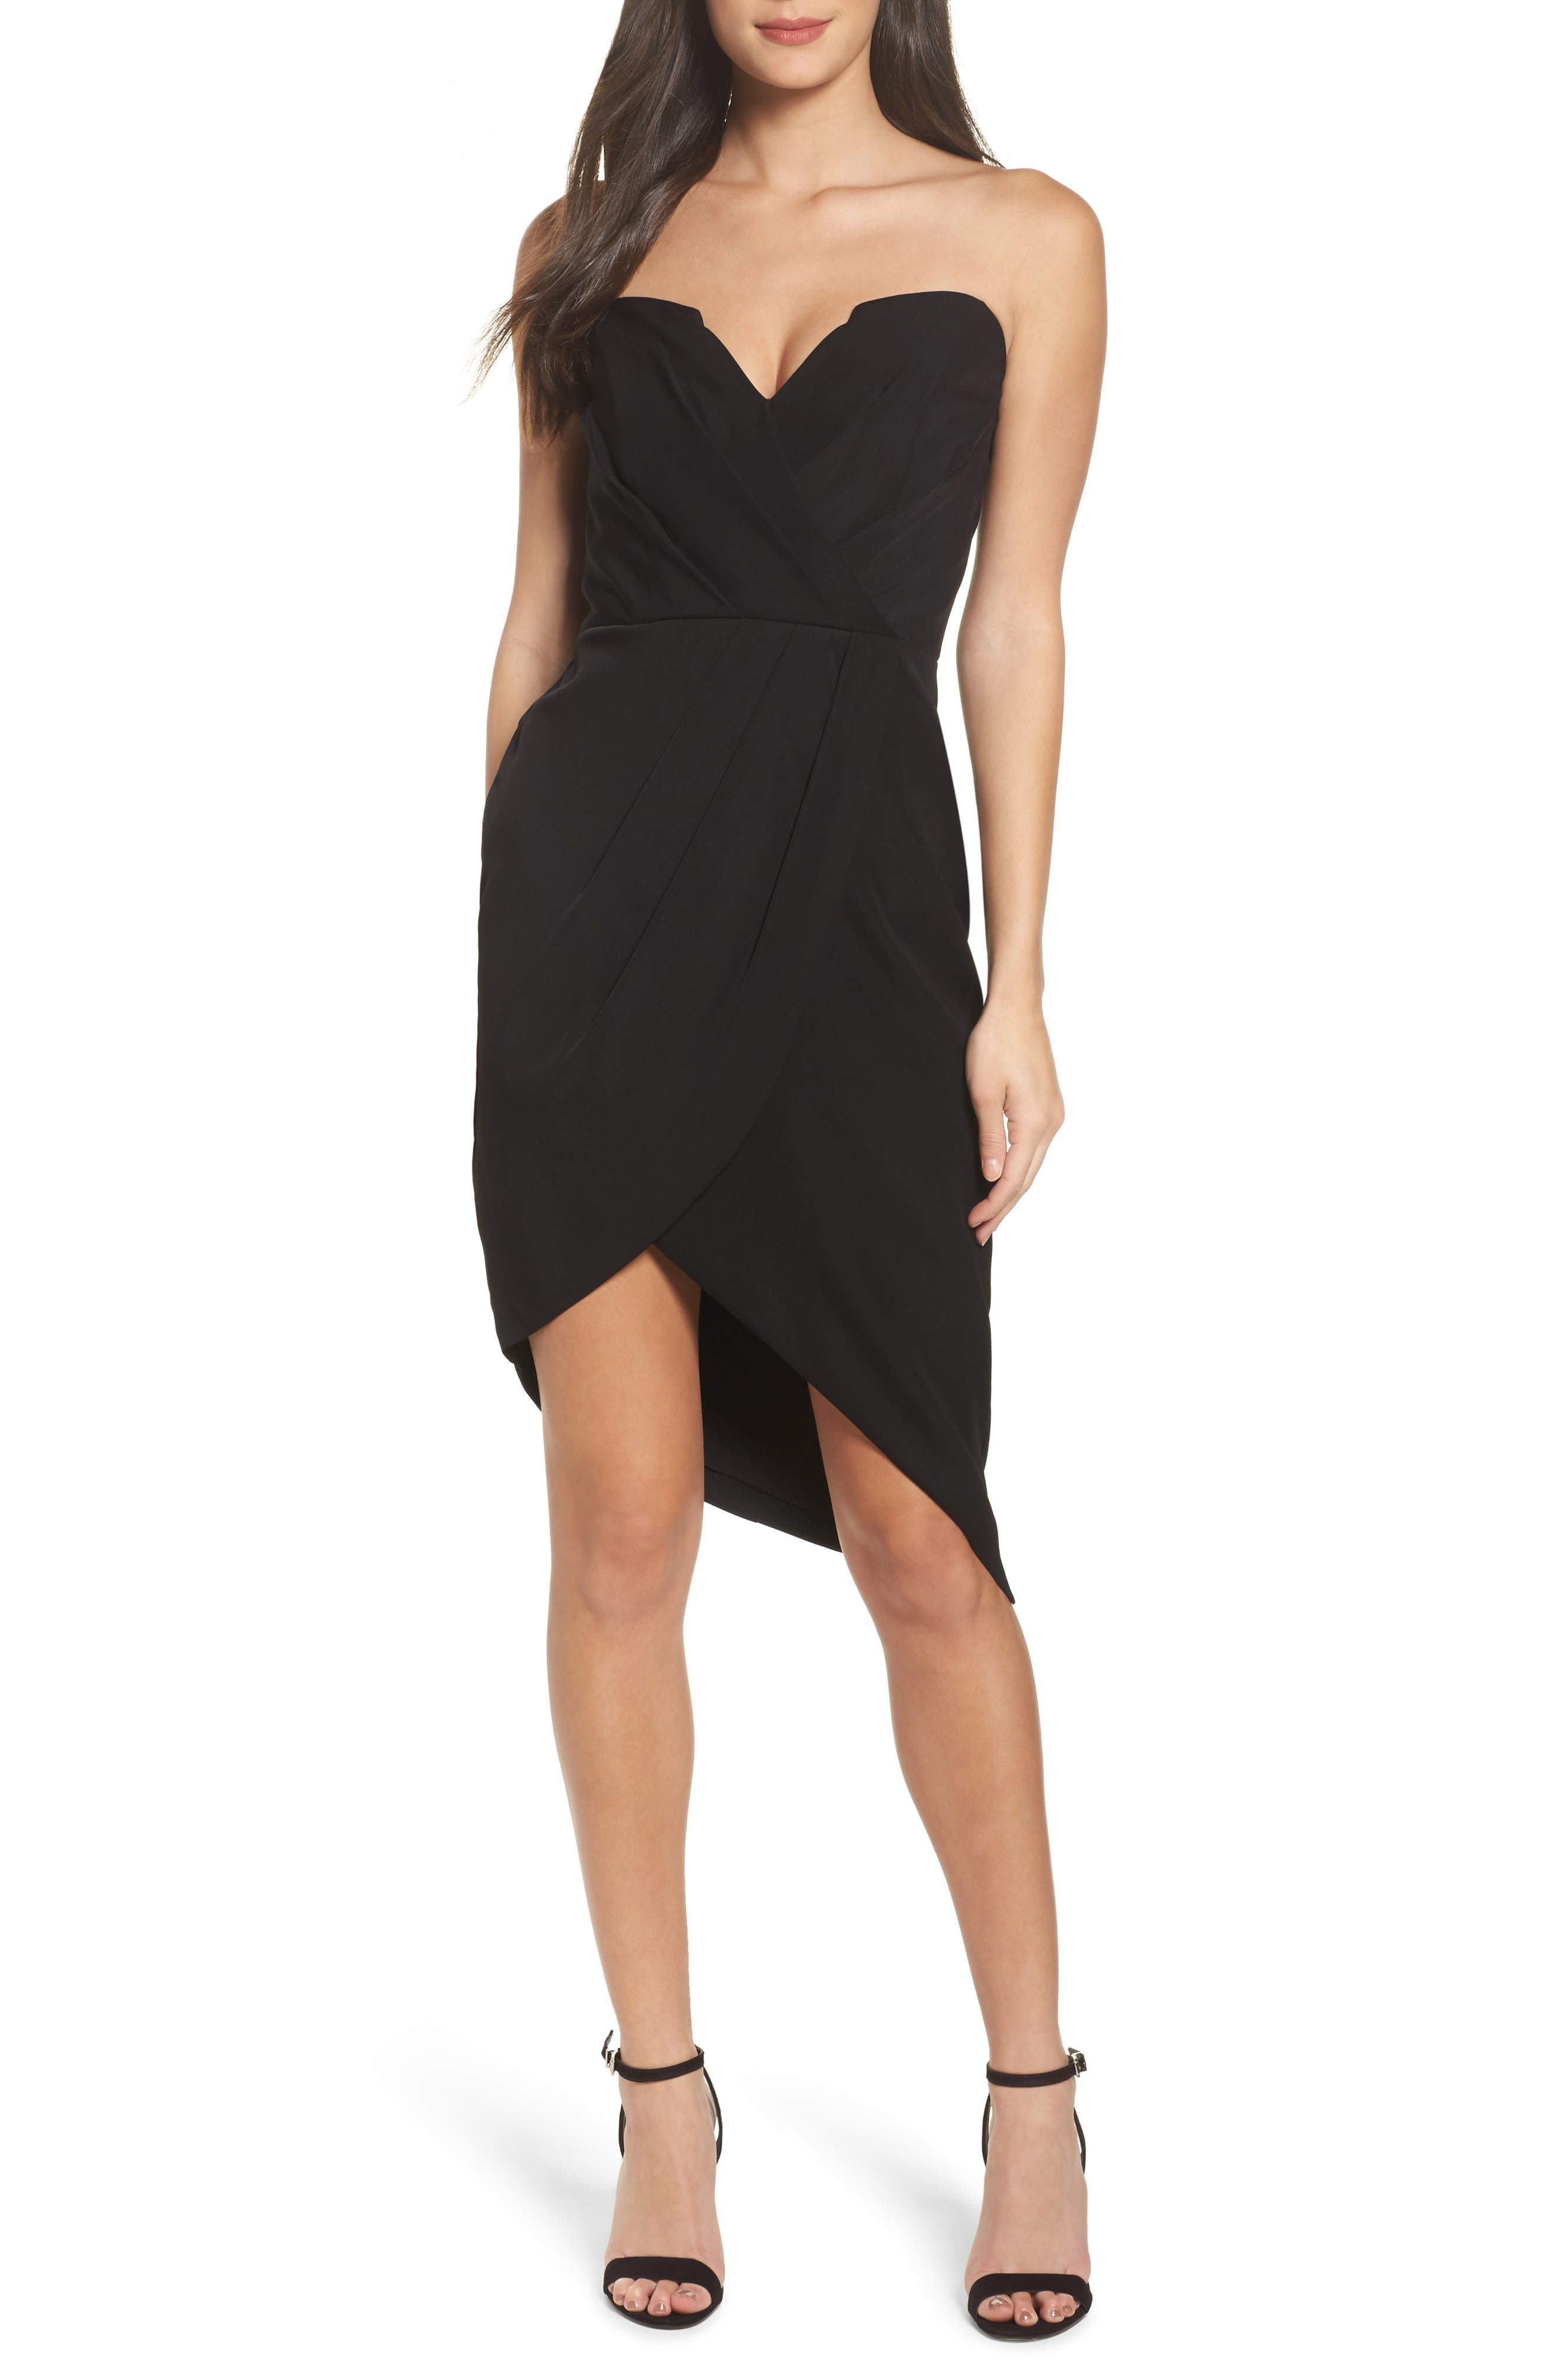 Adelyn Rae Loren Strapless Asymmetric Dress